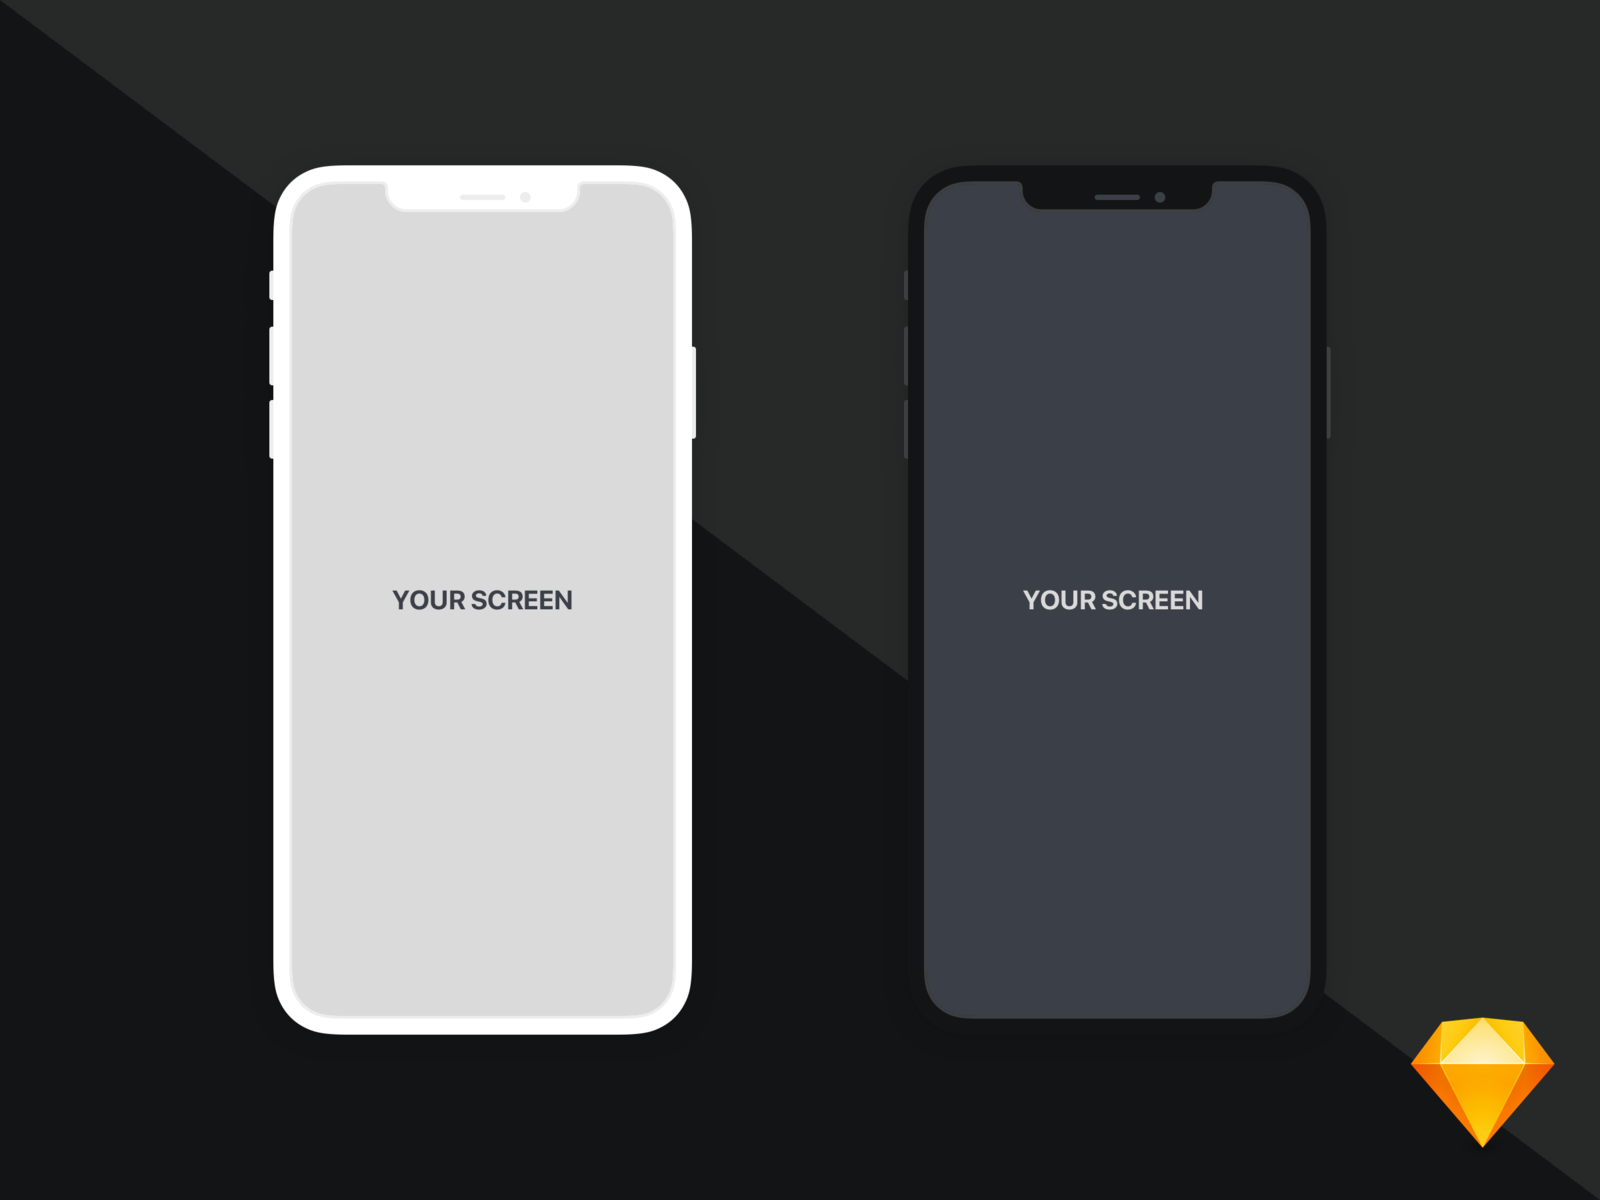 Iphone Xs Max Flat Mockup Iphone Free Mockup Mockup Free Download